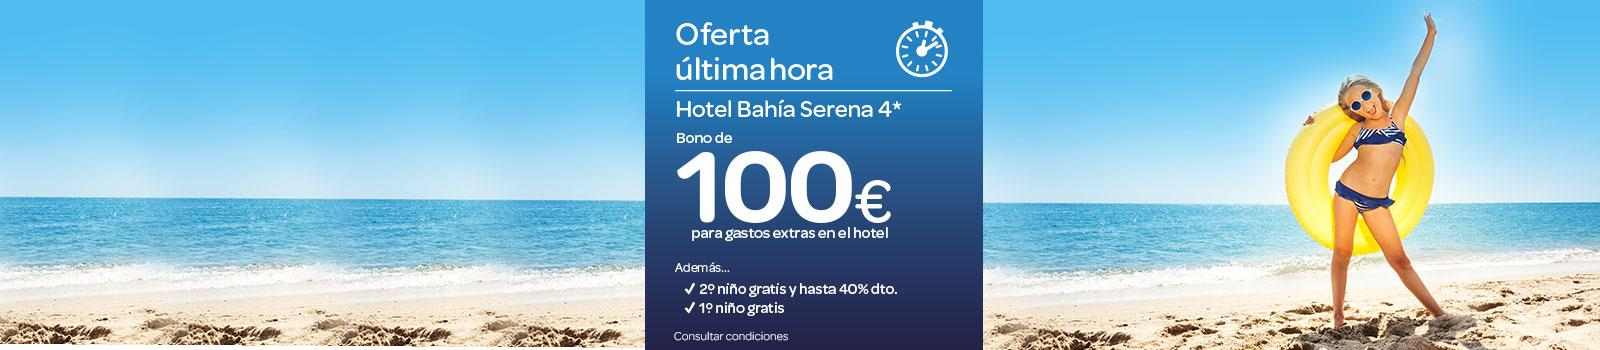 Oferta Última Hora Hotel Bahia Serena